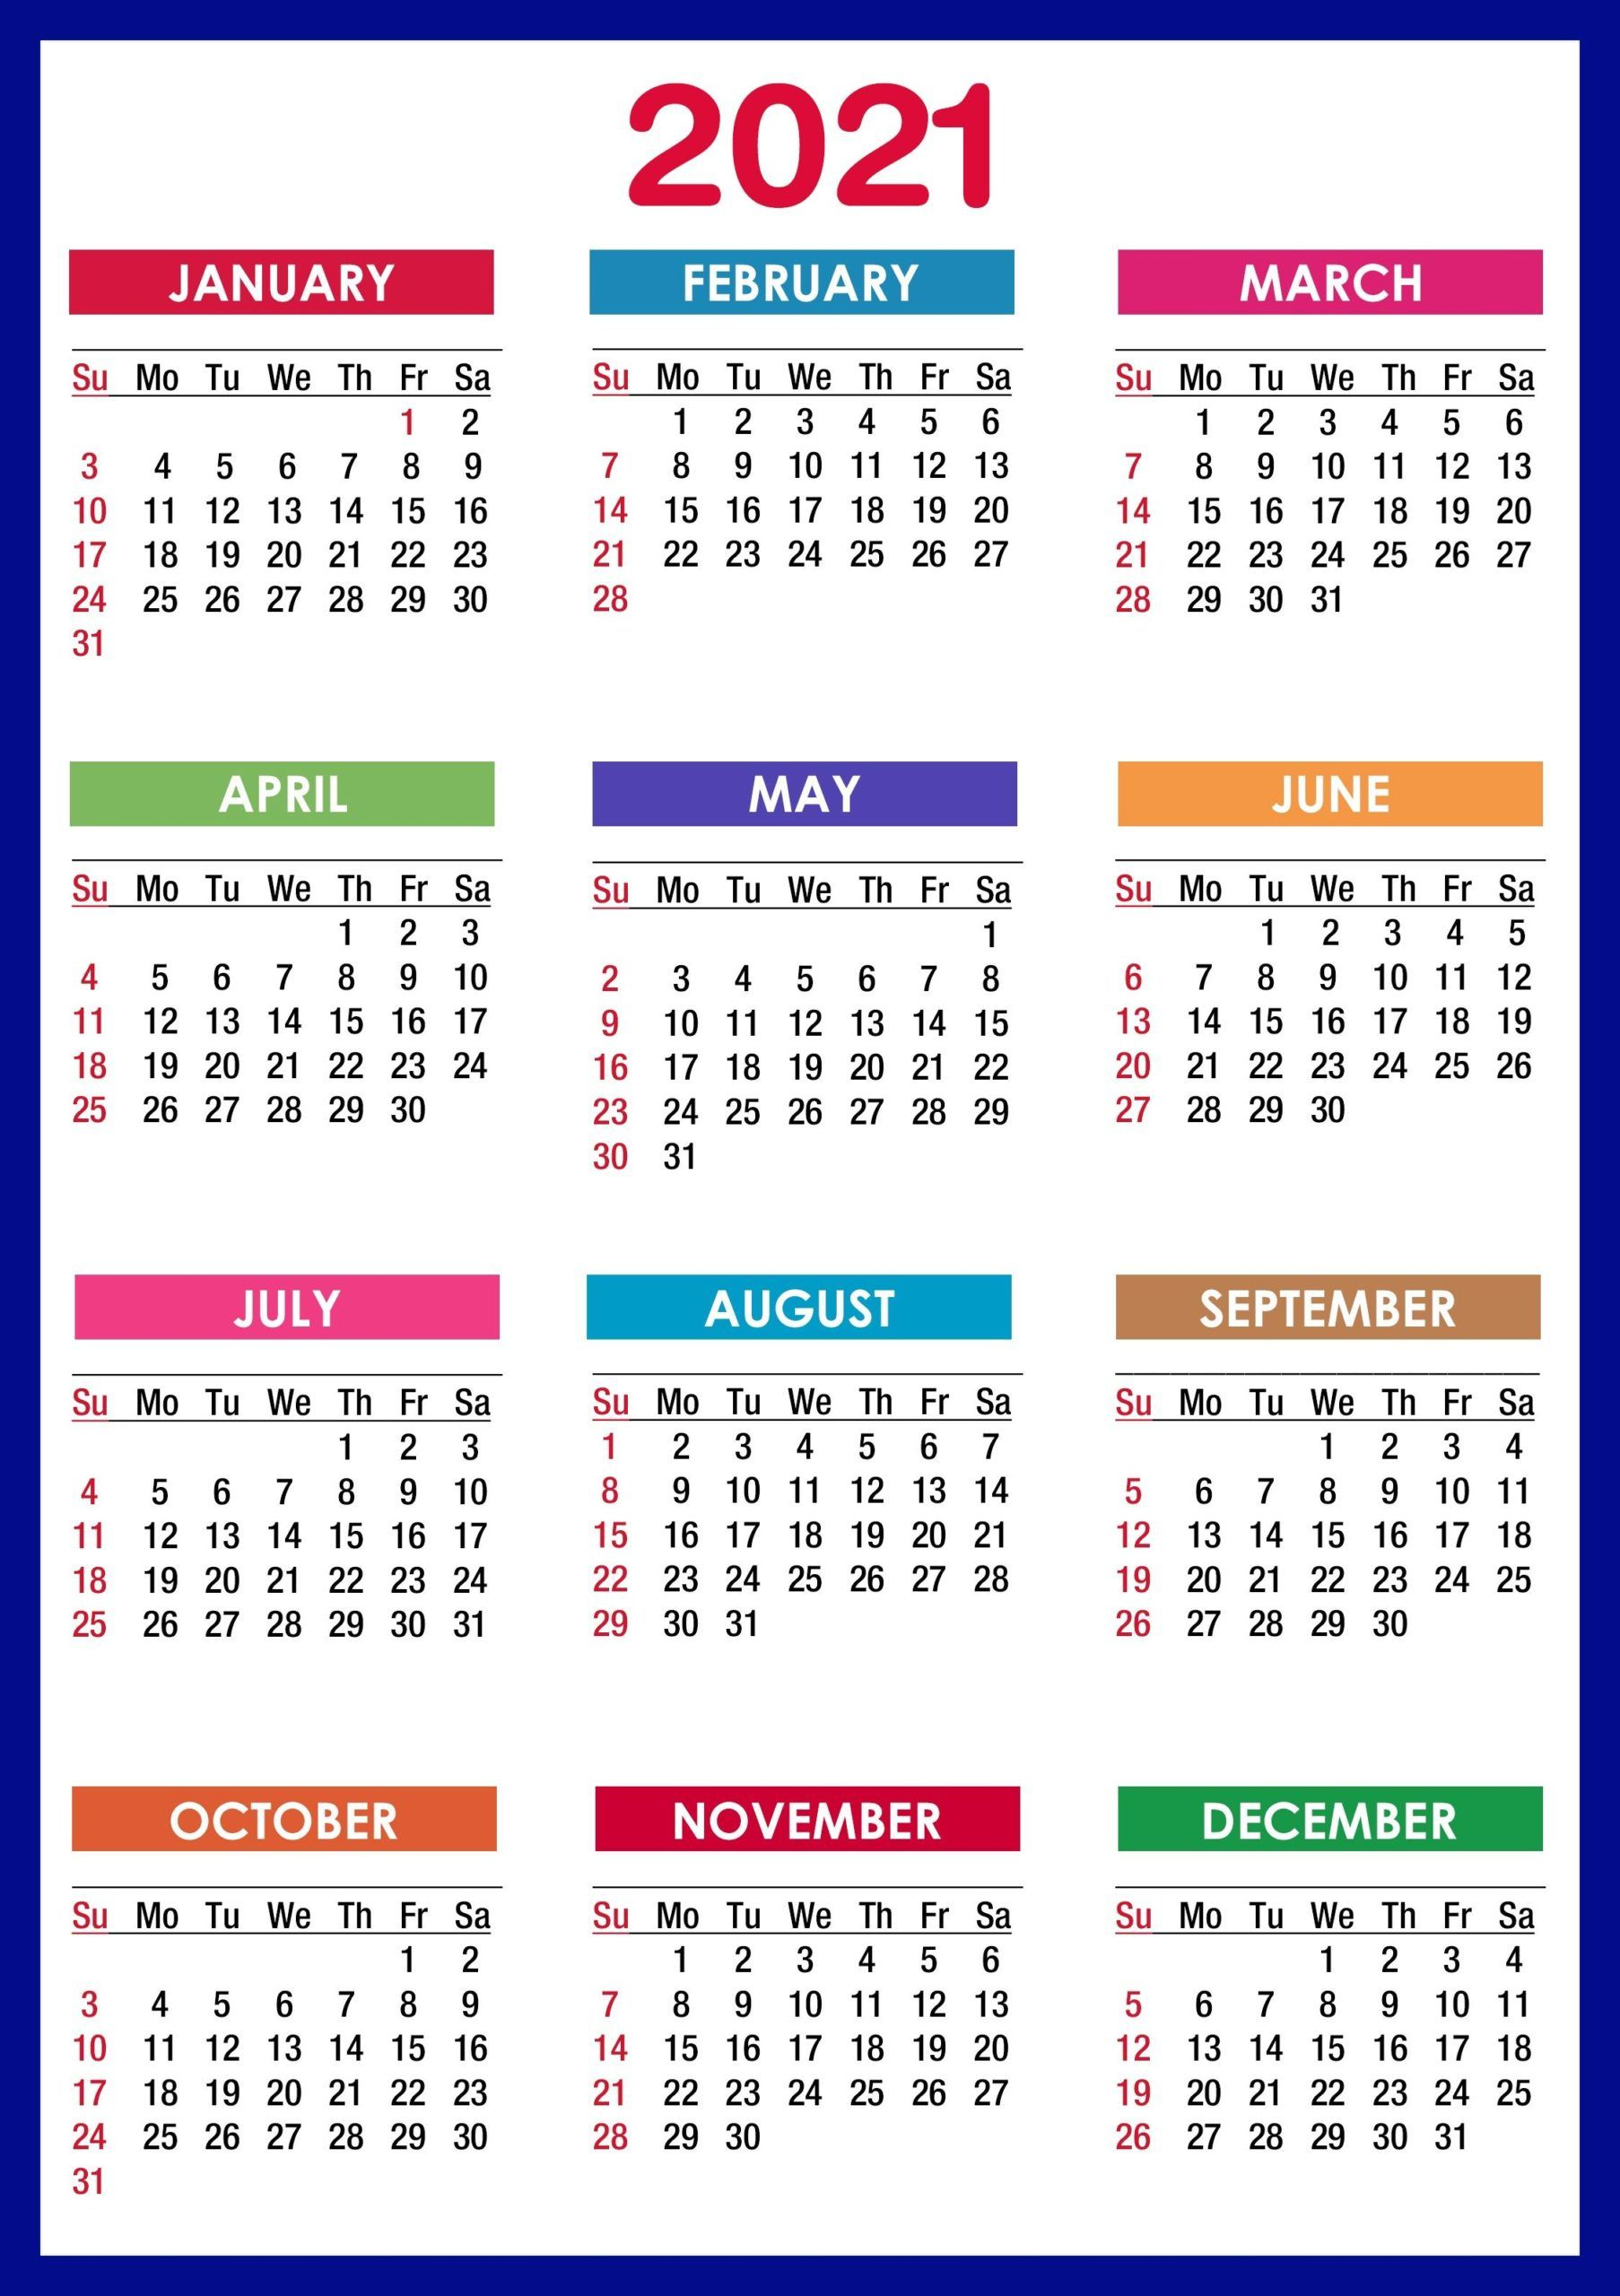 2021 Calendar By Month 2021 Calendar Printable | 12 Months All in One | Calendar 2021